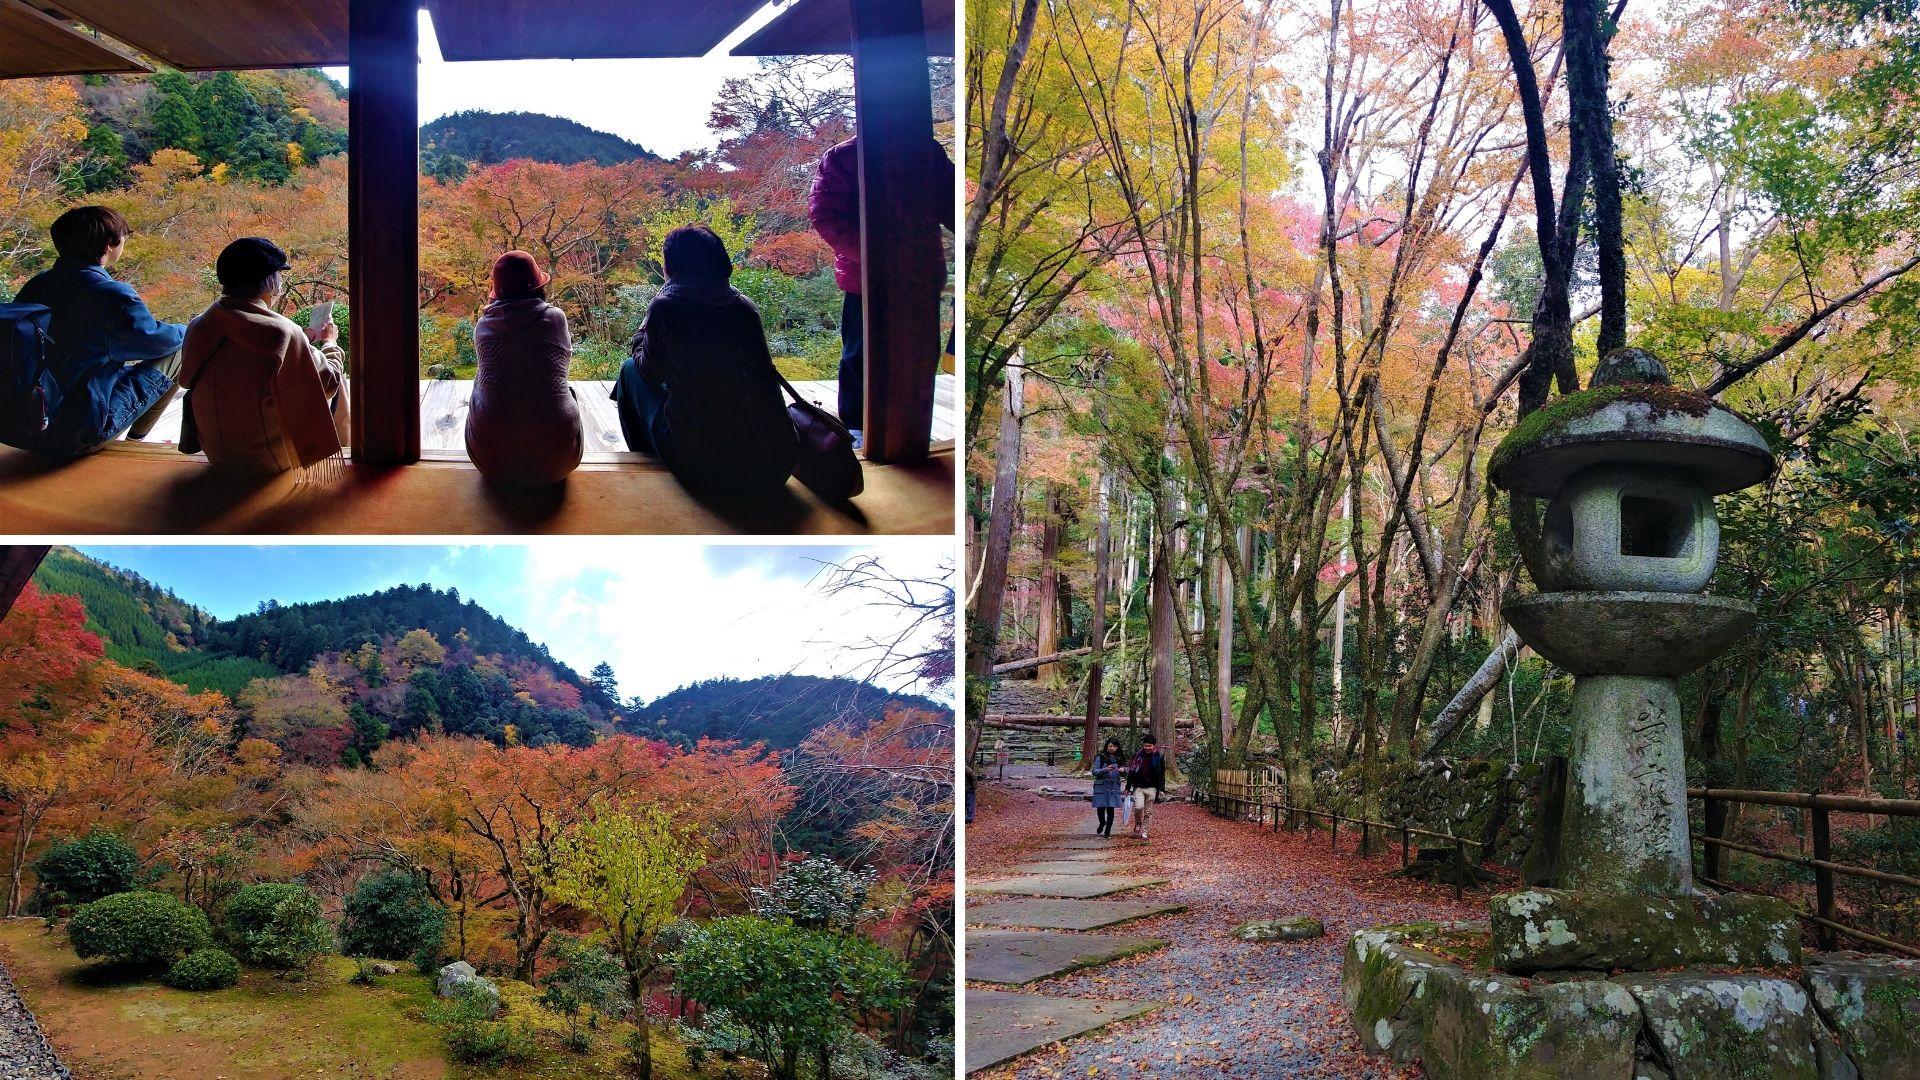 kyoto visiter kozan-ji randonnee blog voyage japon arpenter le chemin